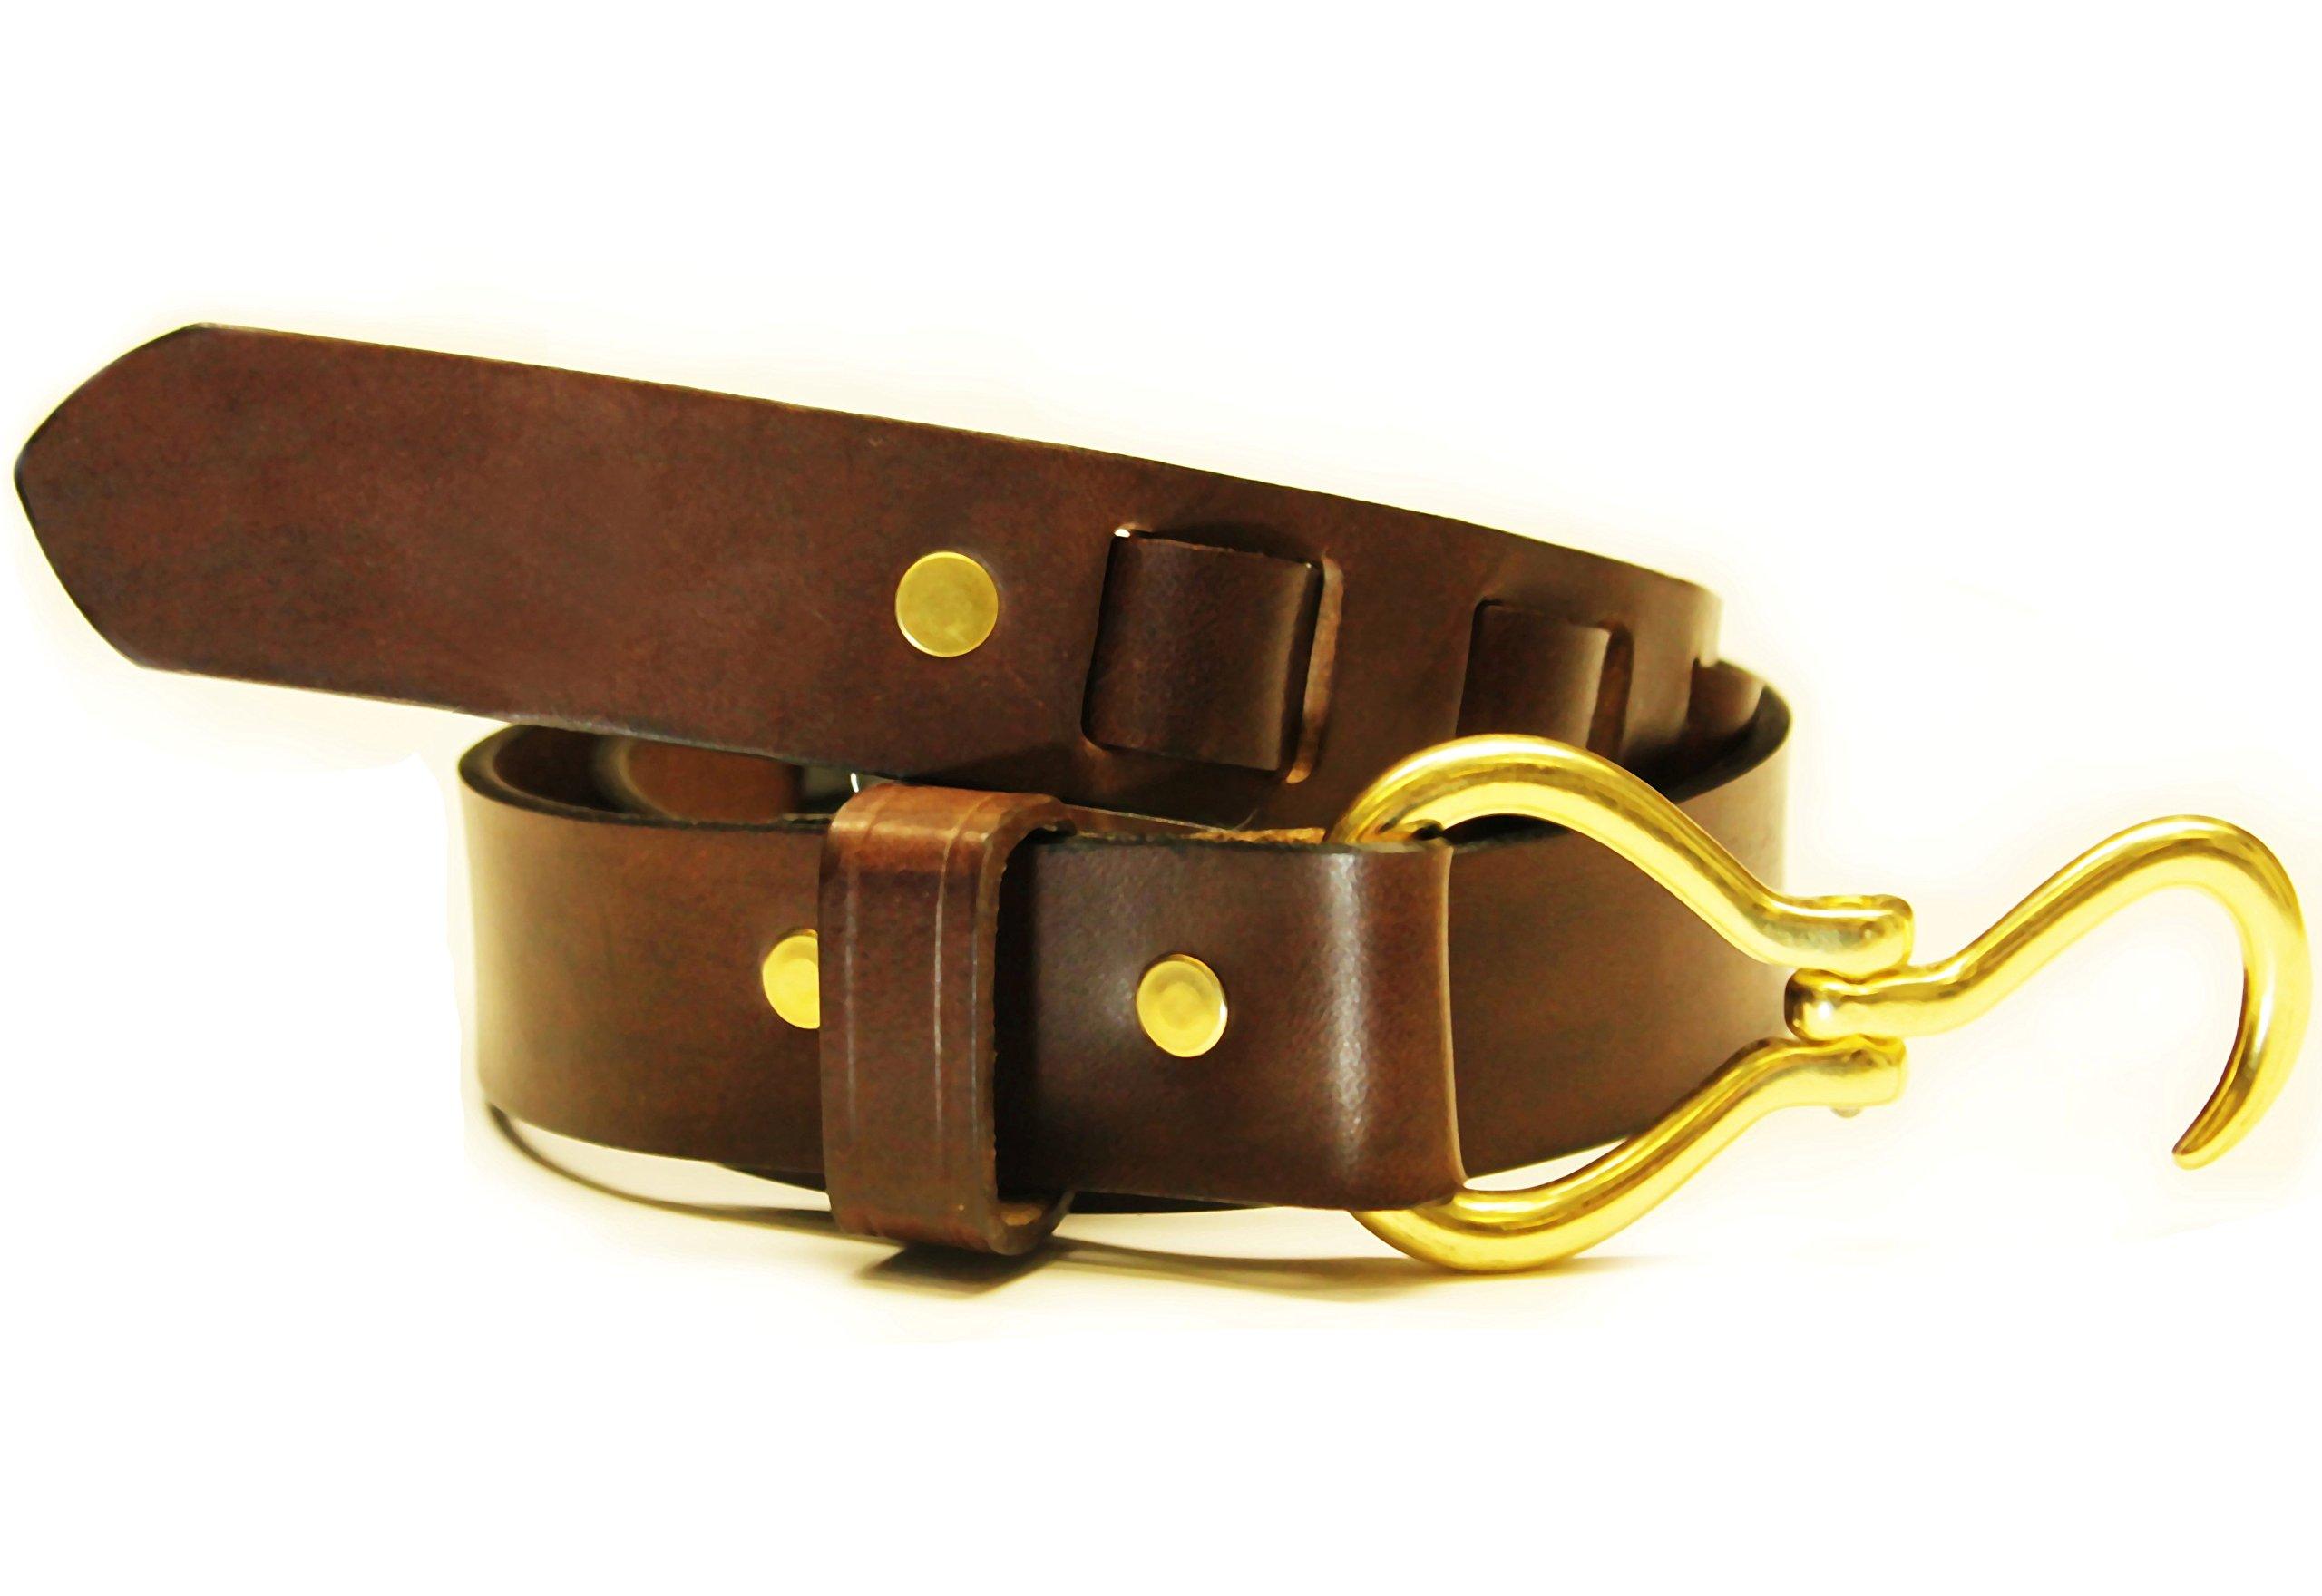 "American Bench Craft Women's Hoof Pick Belt (Fits 30-32"" Waist)"